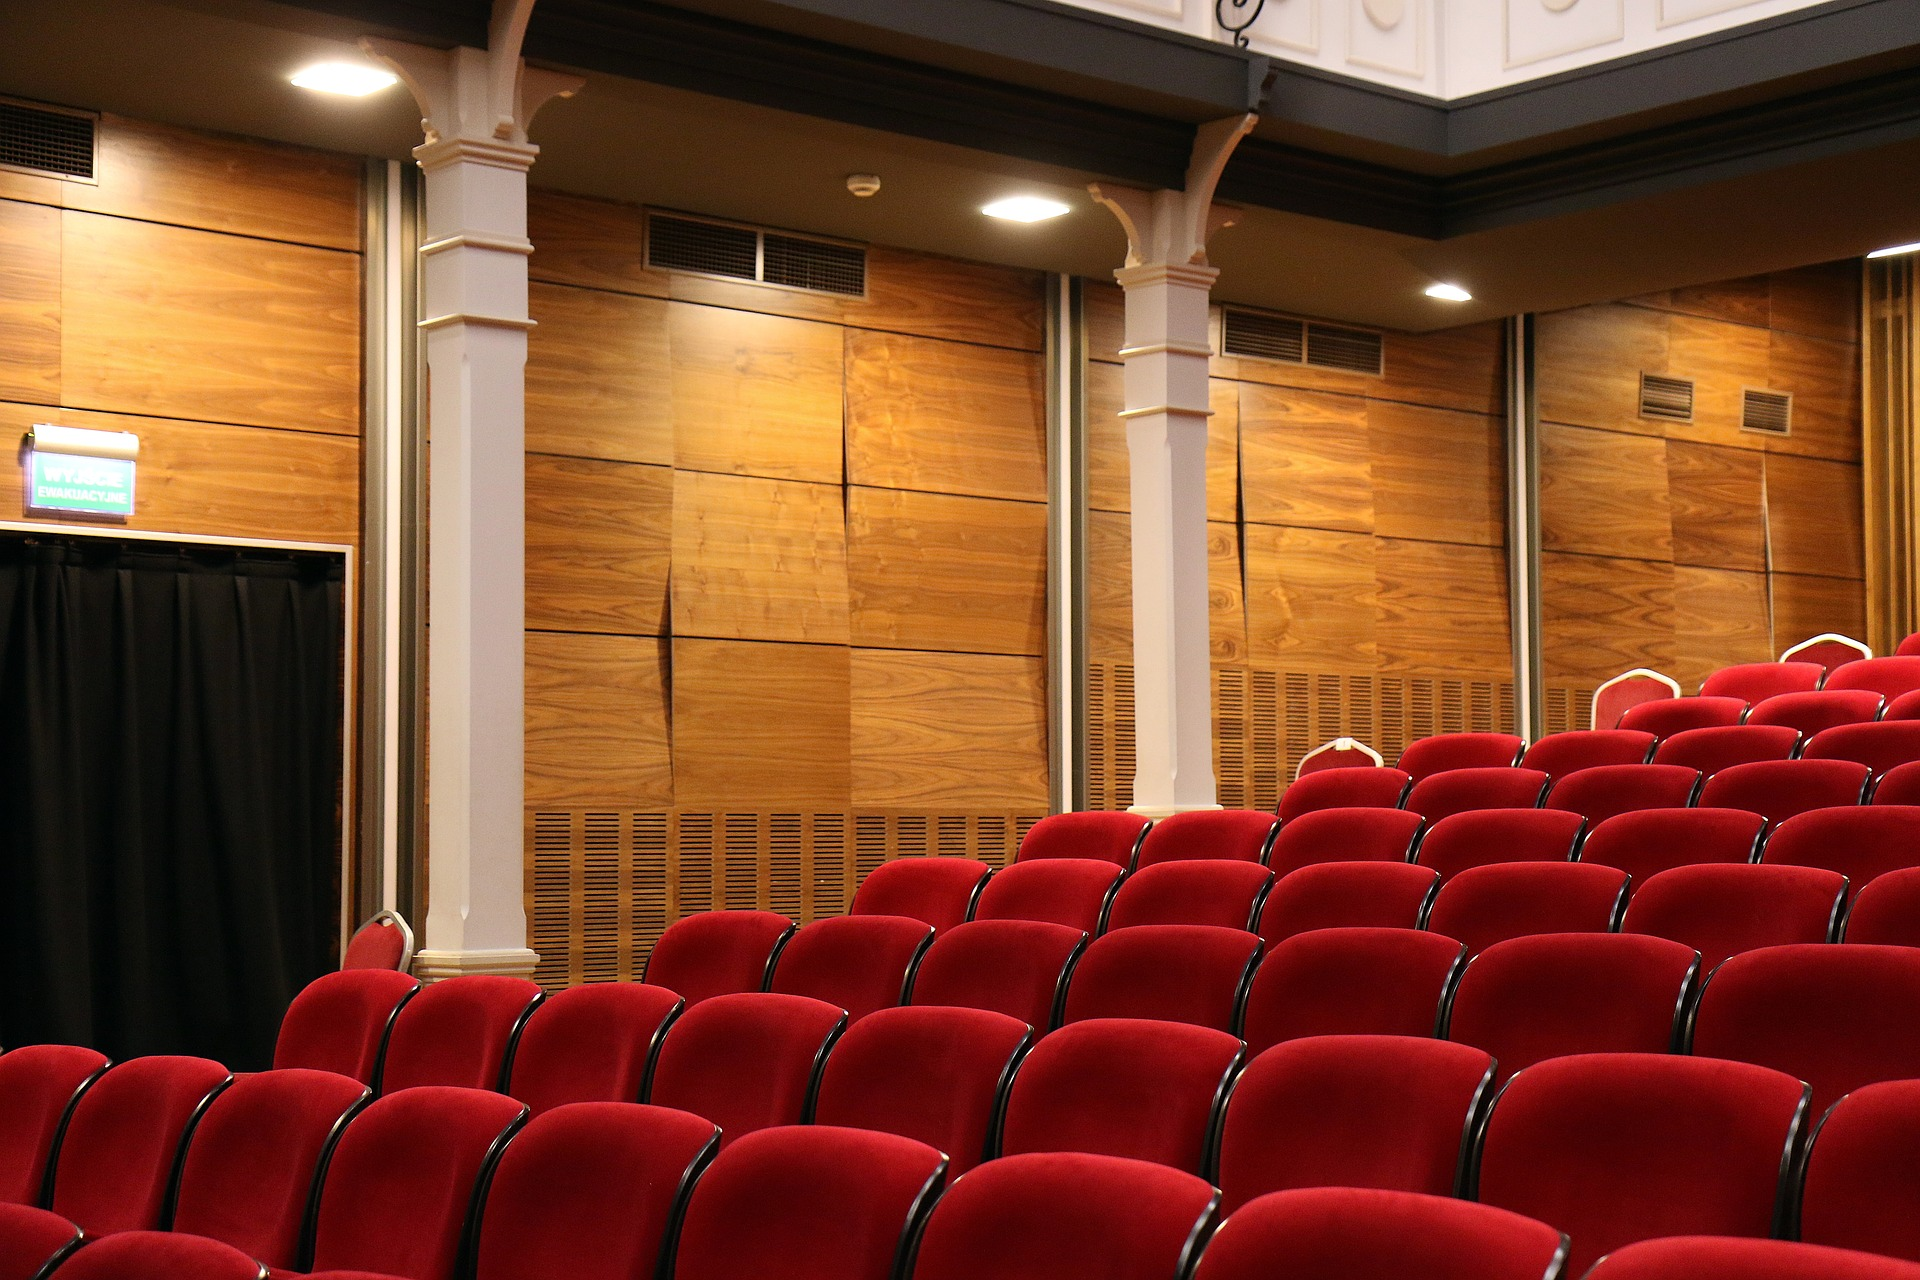 Southeast Michigan's Cinetopia Film Festival Announces Their 2017 Film Lineup